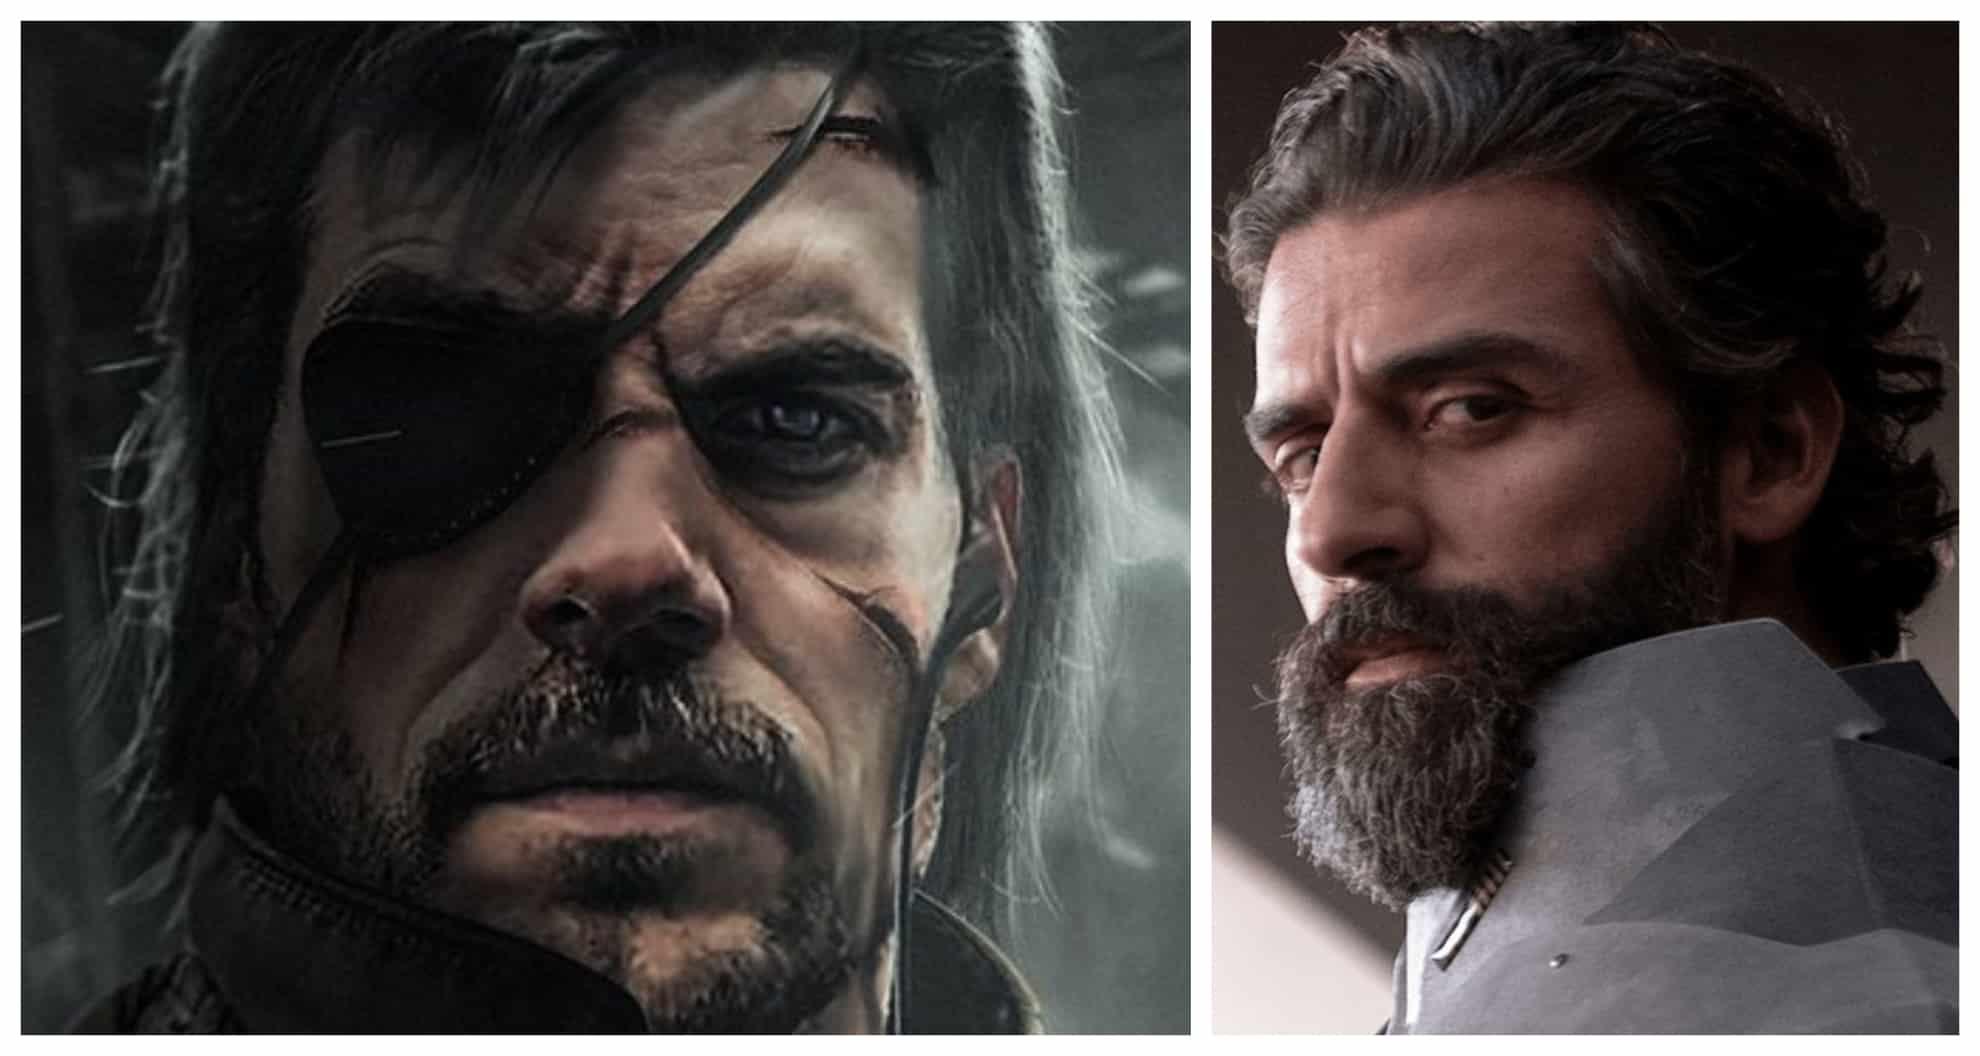 Metal Gear Solid – svelato il ruolo di Oscar Isaac: curiosi?